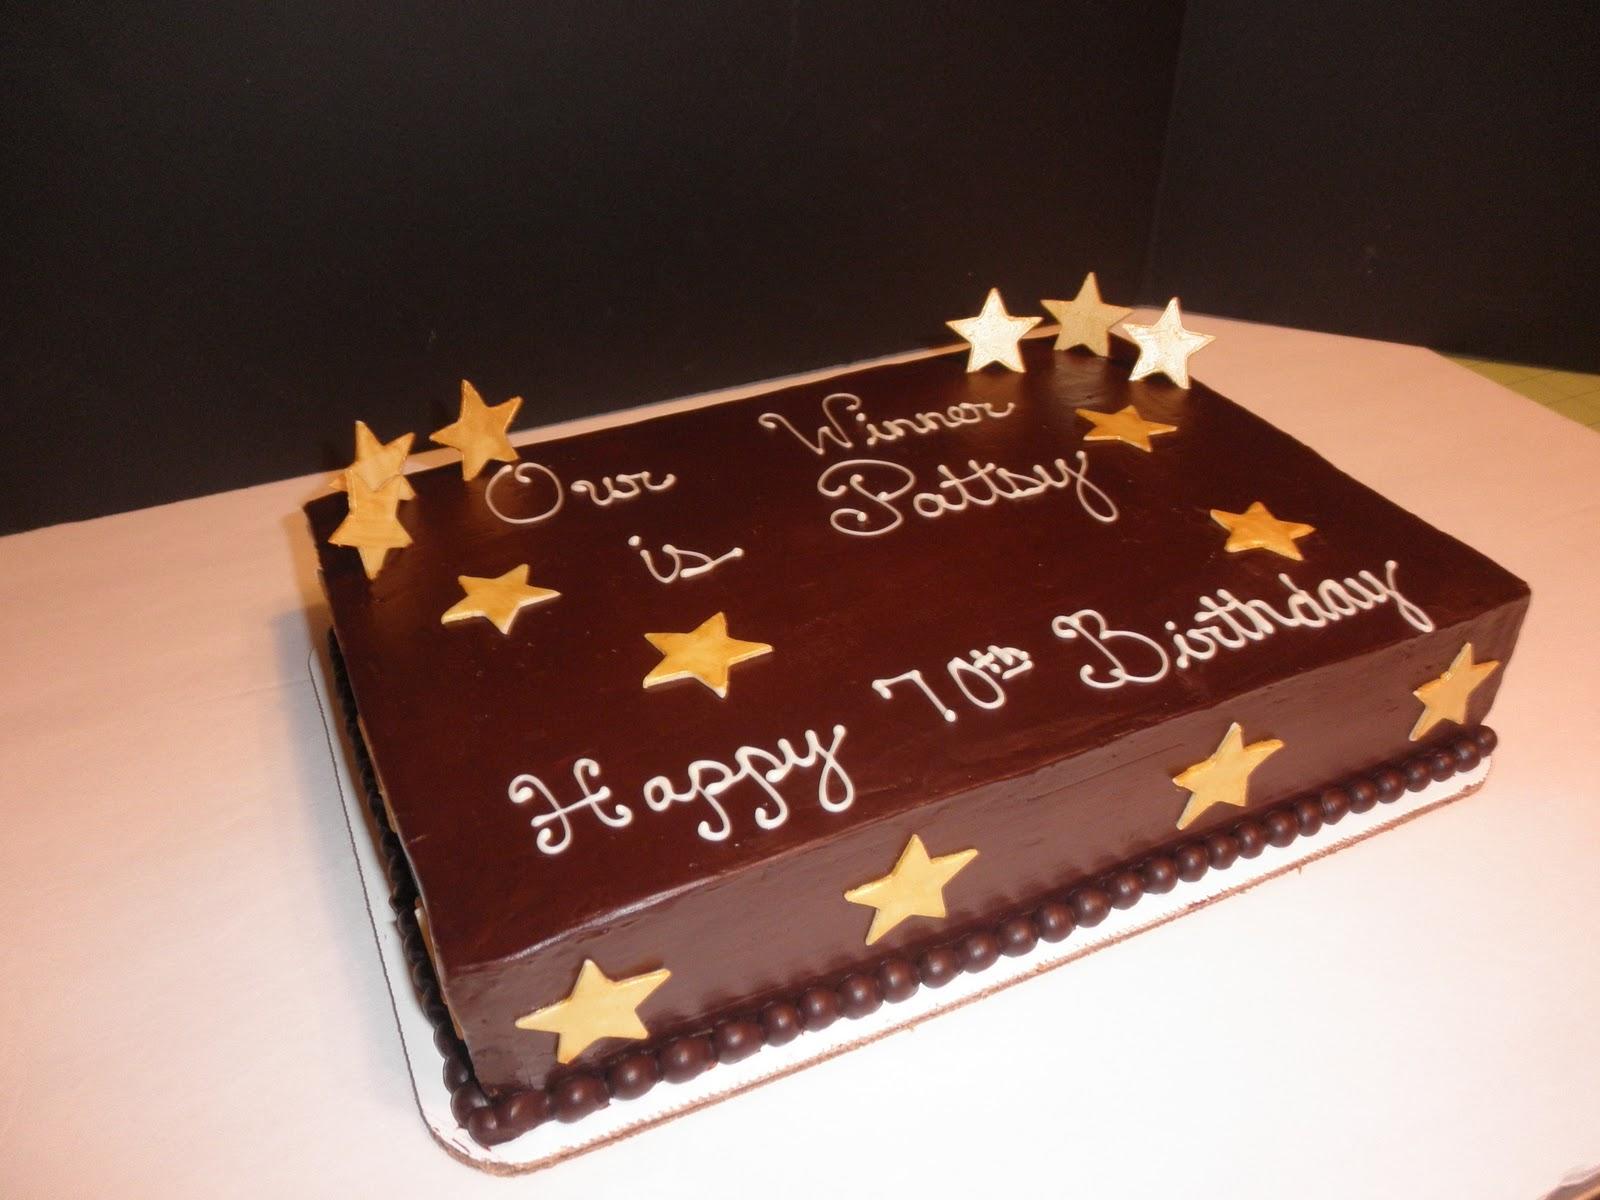 6 Decorated Birthday Sheet Cakes Chocolate Icing Photo Chocolate